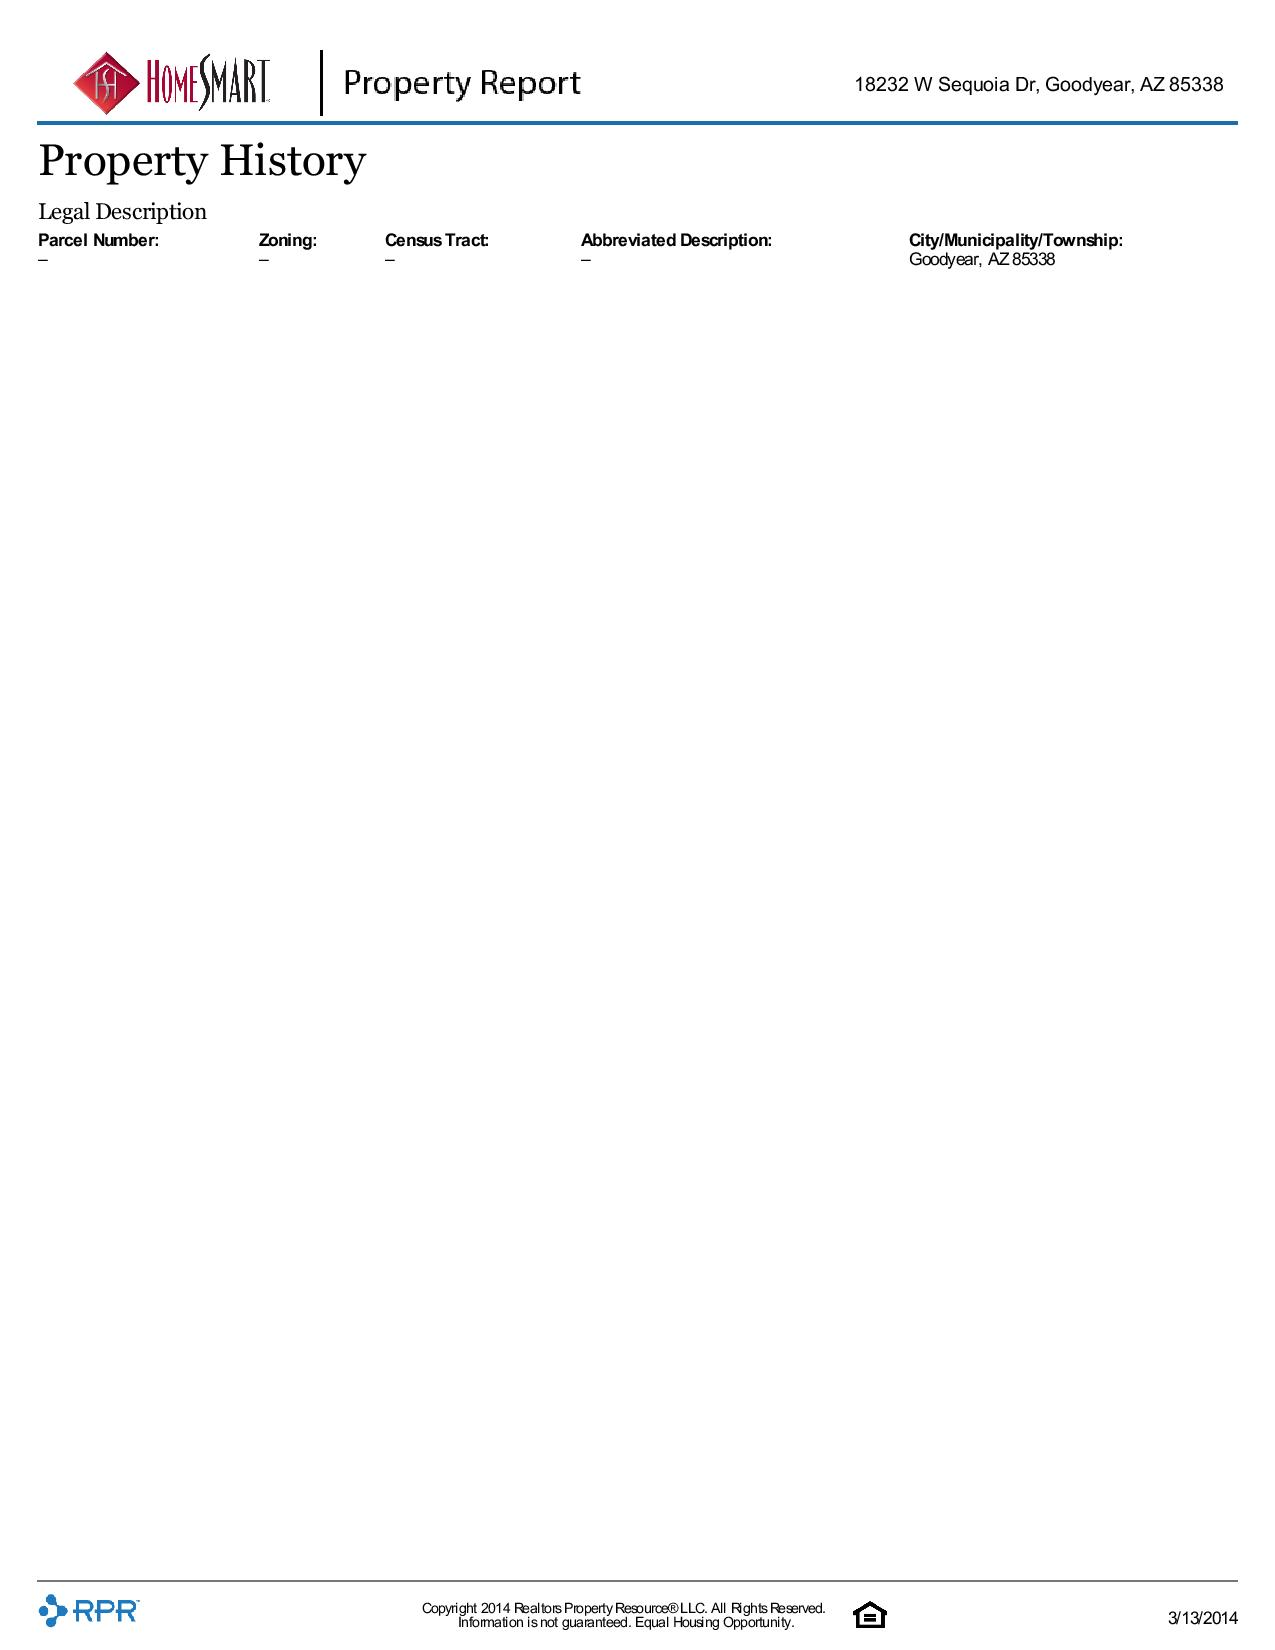 18232-W-Sequoia-Dr-Goodyear-AZ-85338-page-006